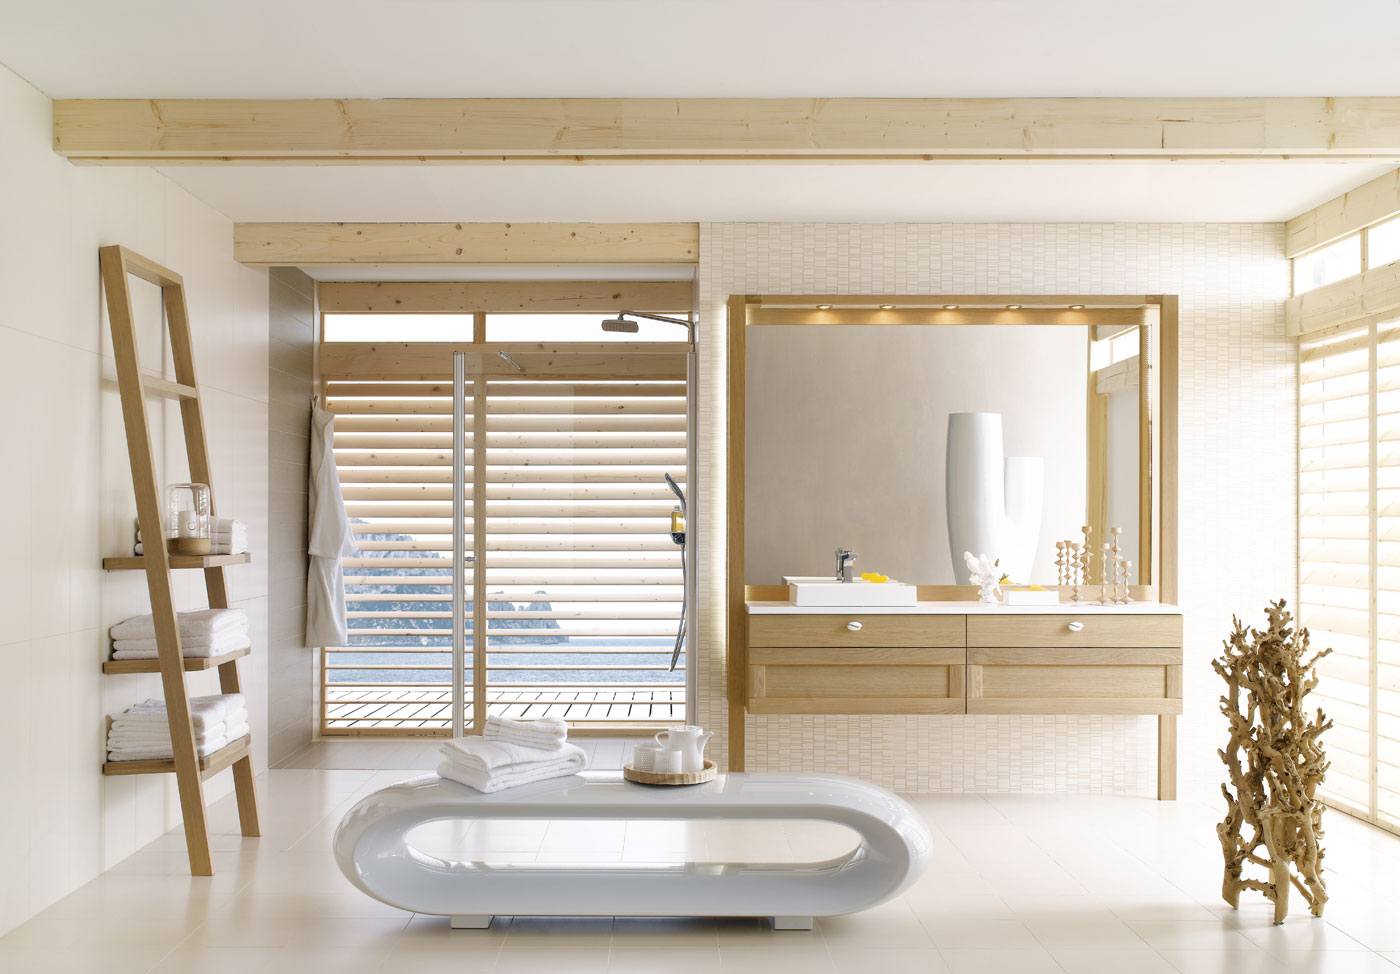 Destock Salle De Bain Maison Design